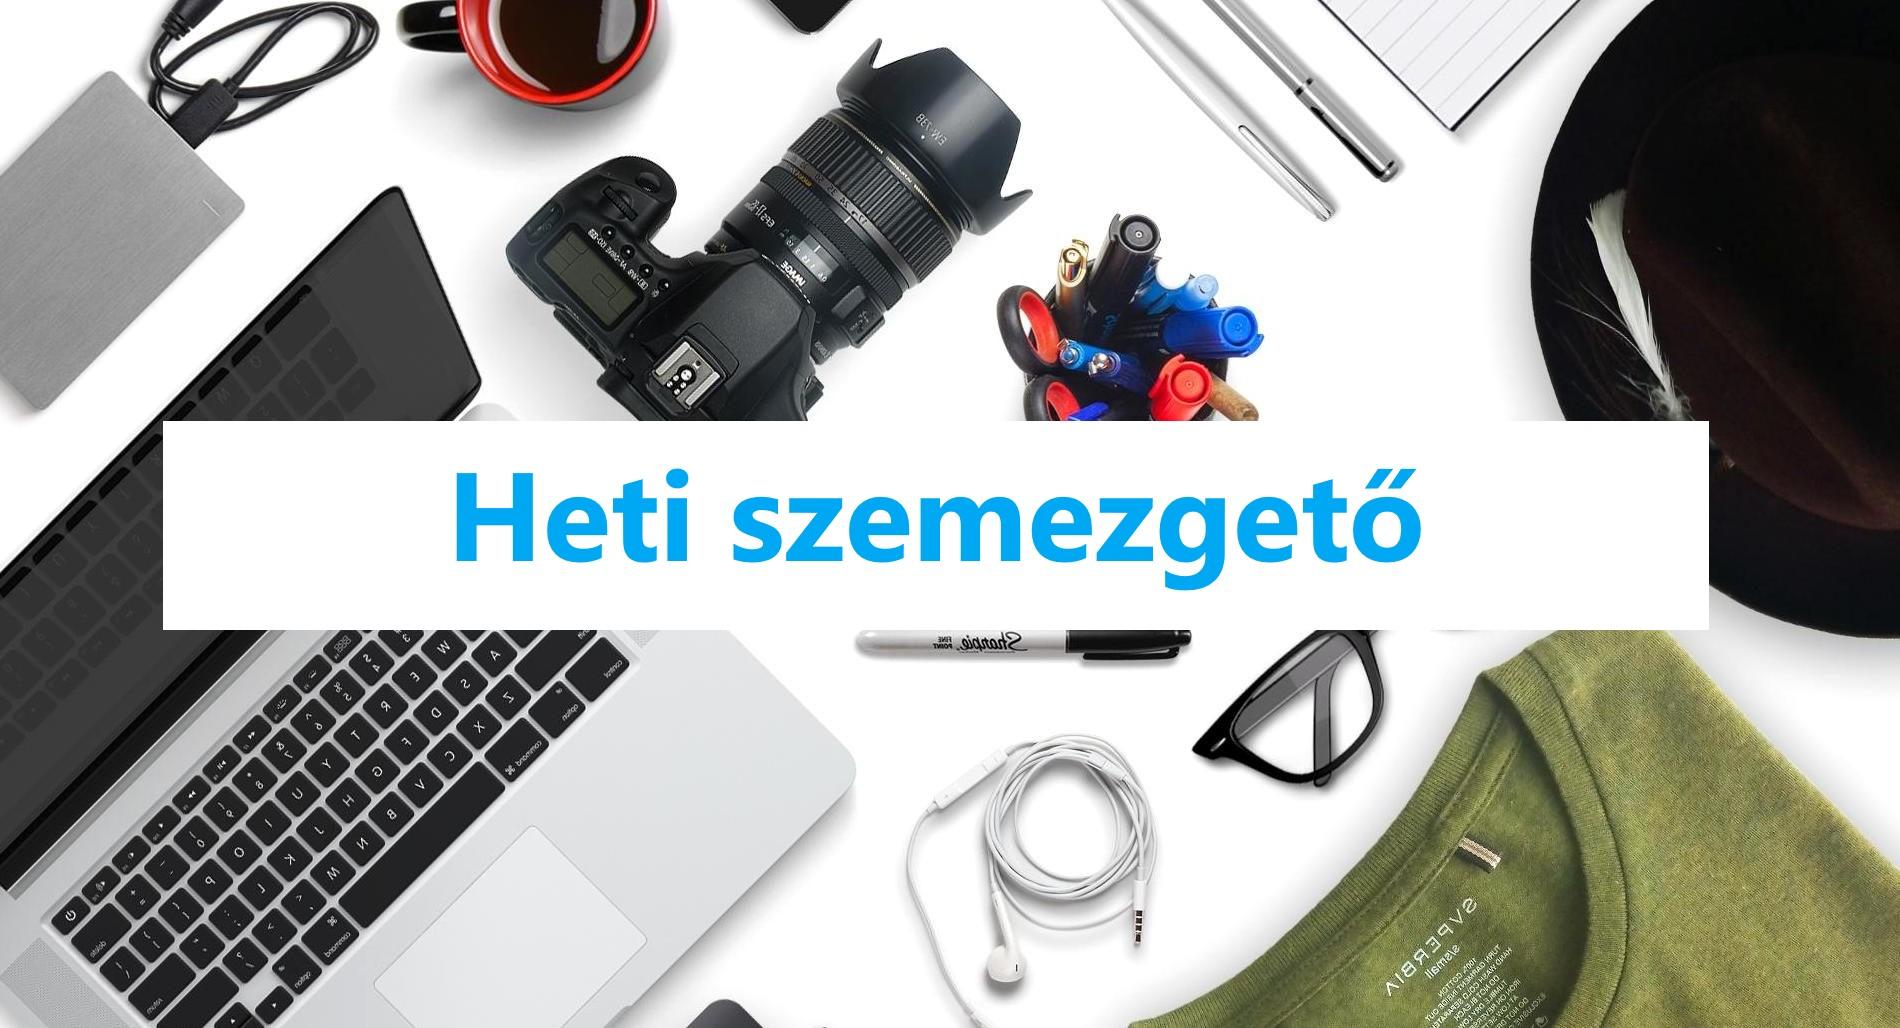 heti_szemezgeto_uj_93.jpg